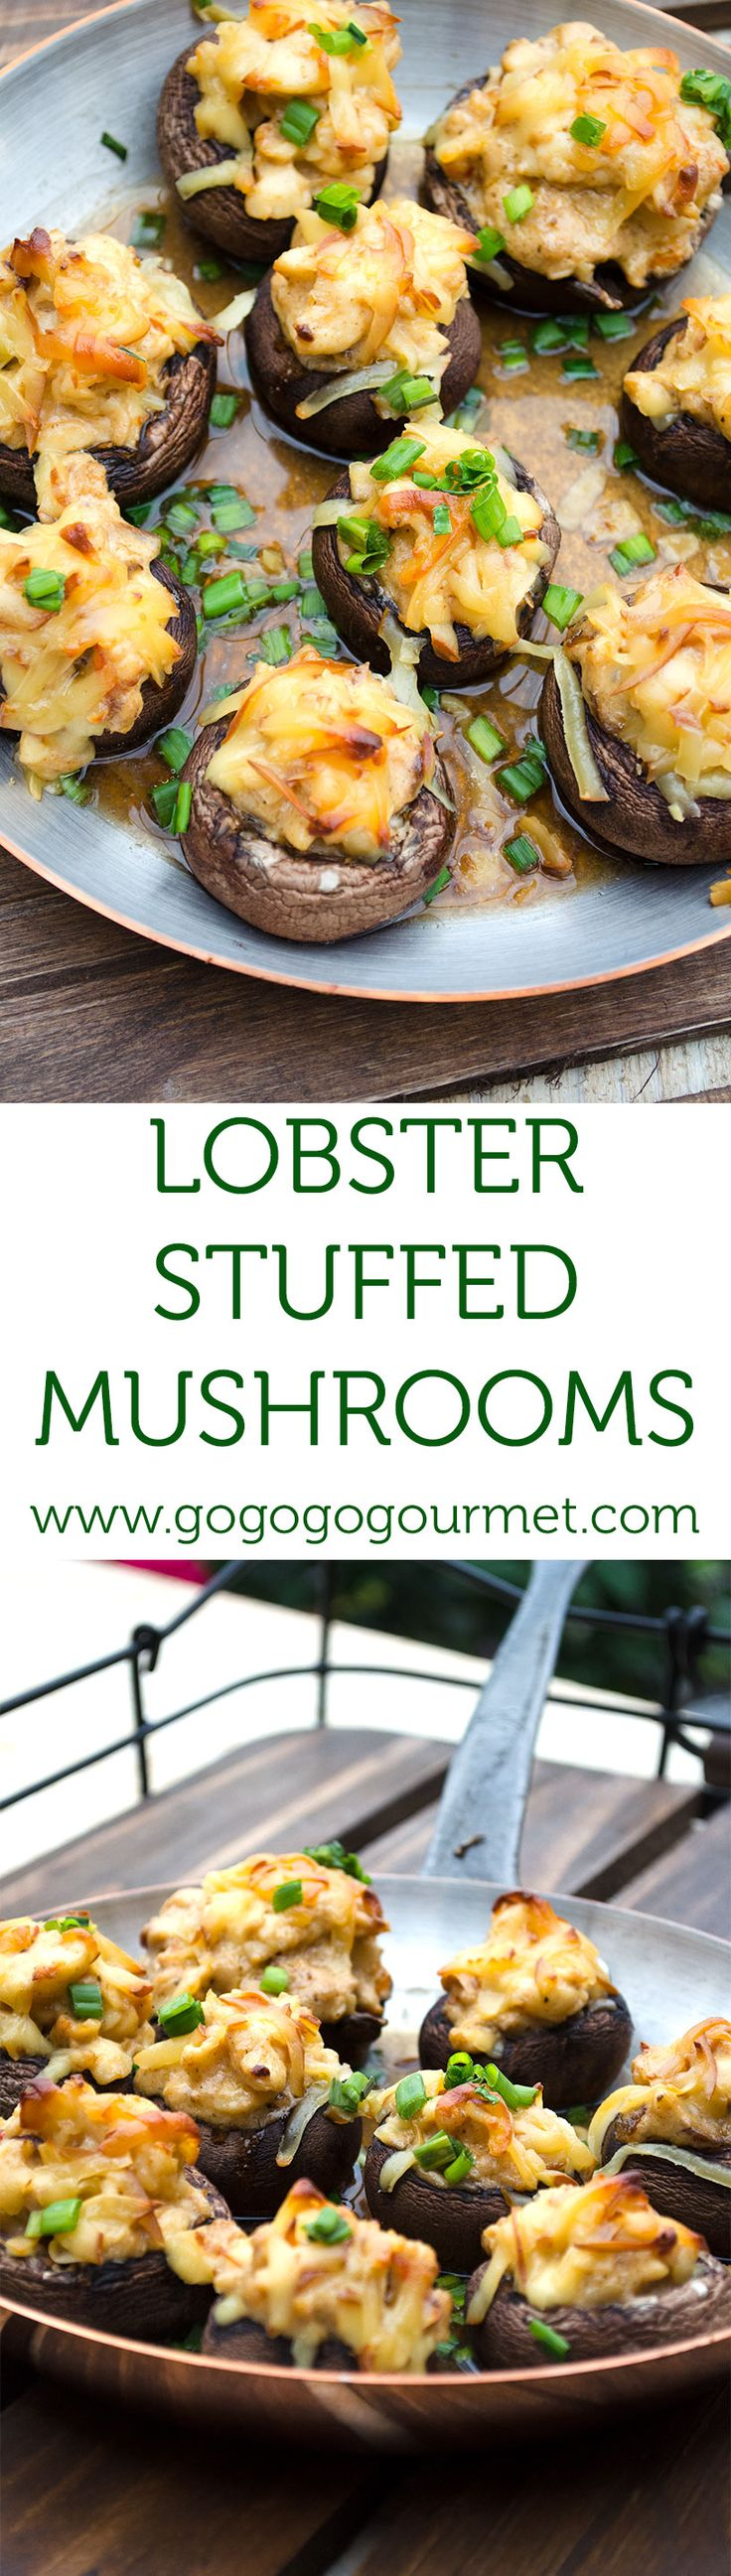 how to make seafood stuffed mushrooms